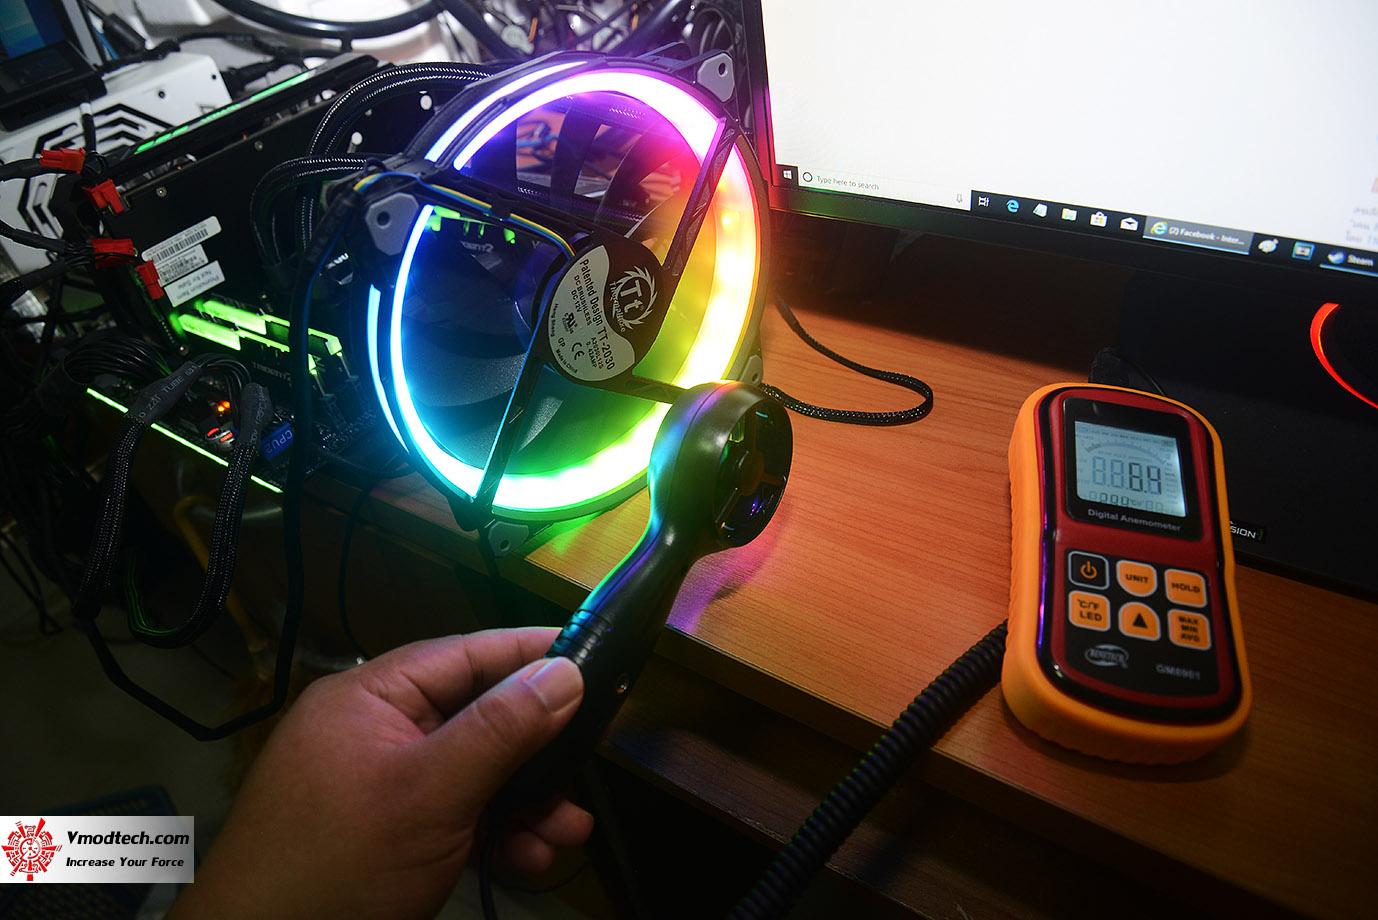 dsc 6730 Thermaltake Riing Plus 20 RGB Case Fan TT Premium Edition (Single Fan Pack w/o Controller) Review